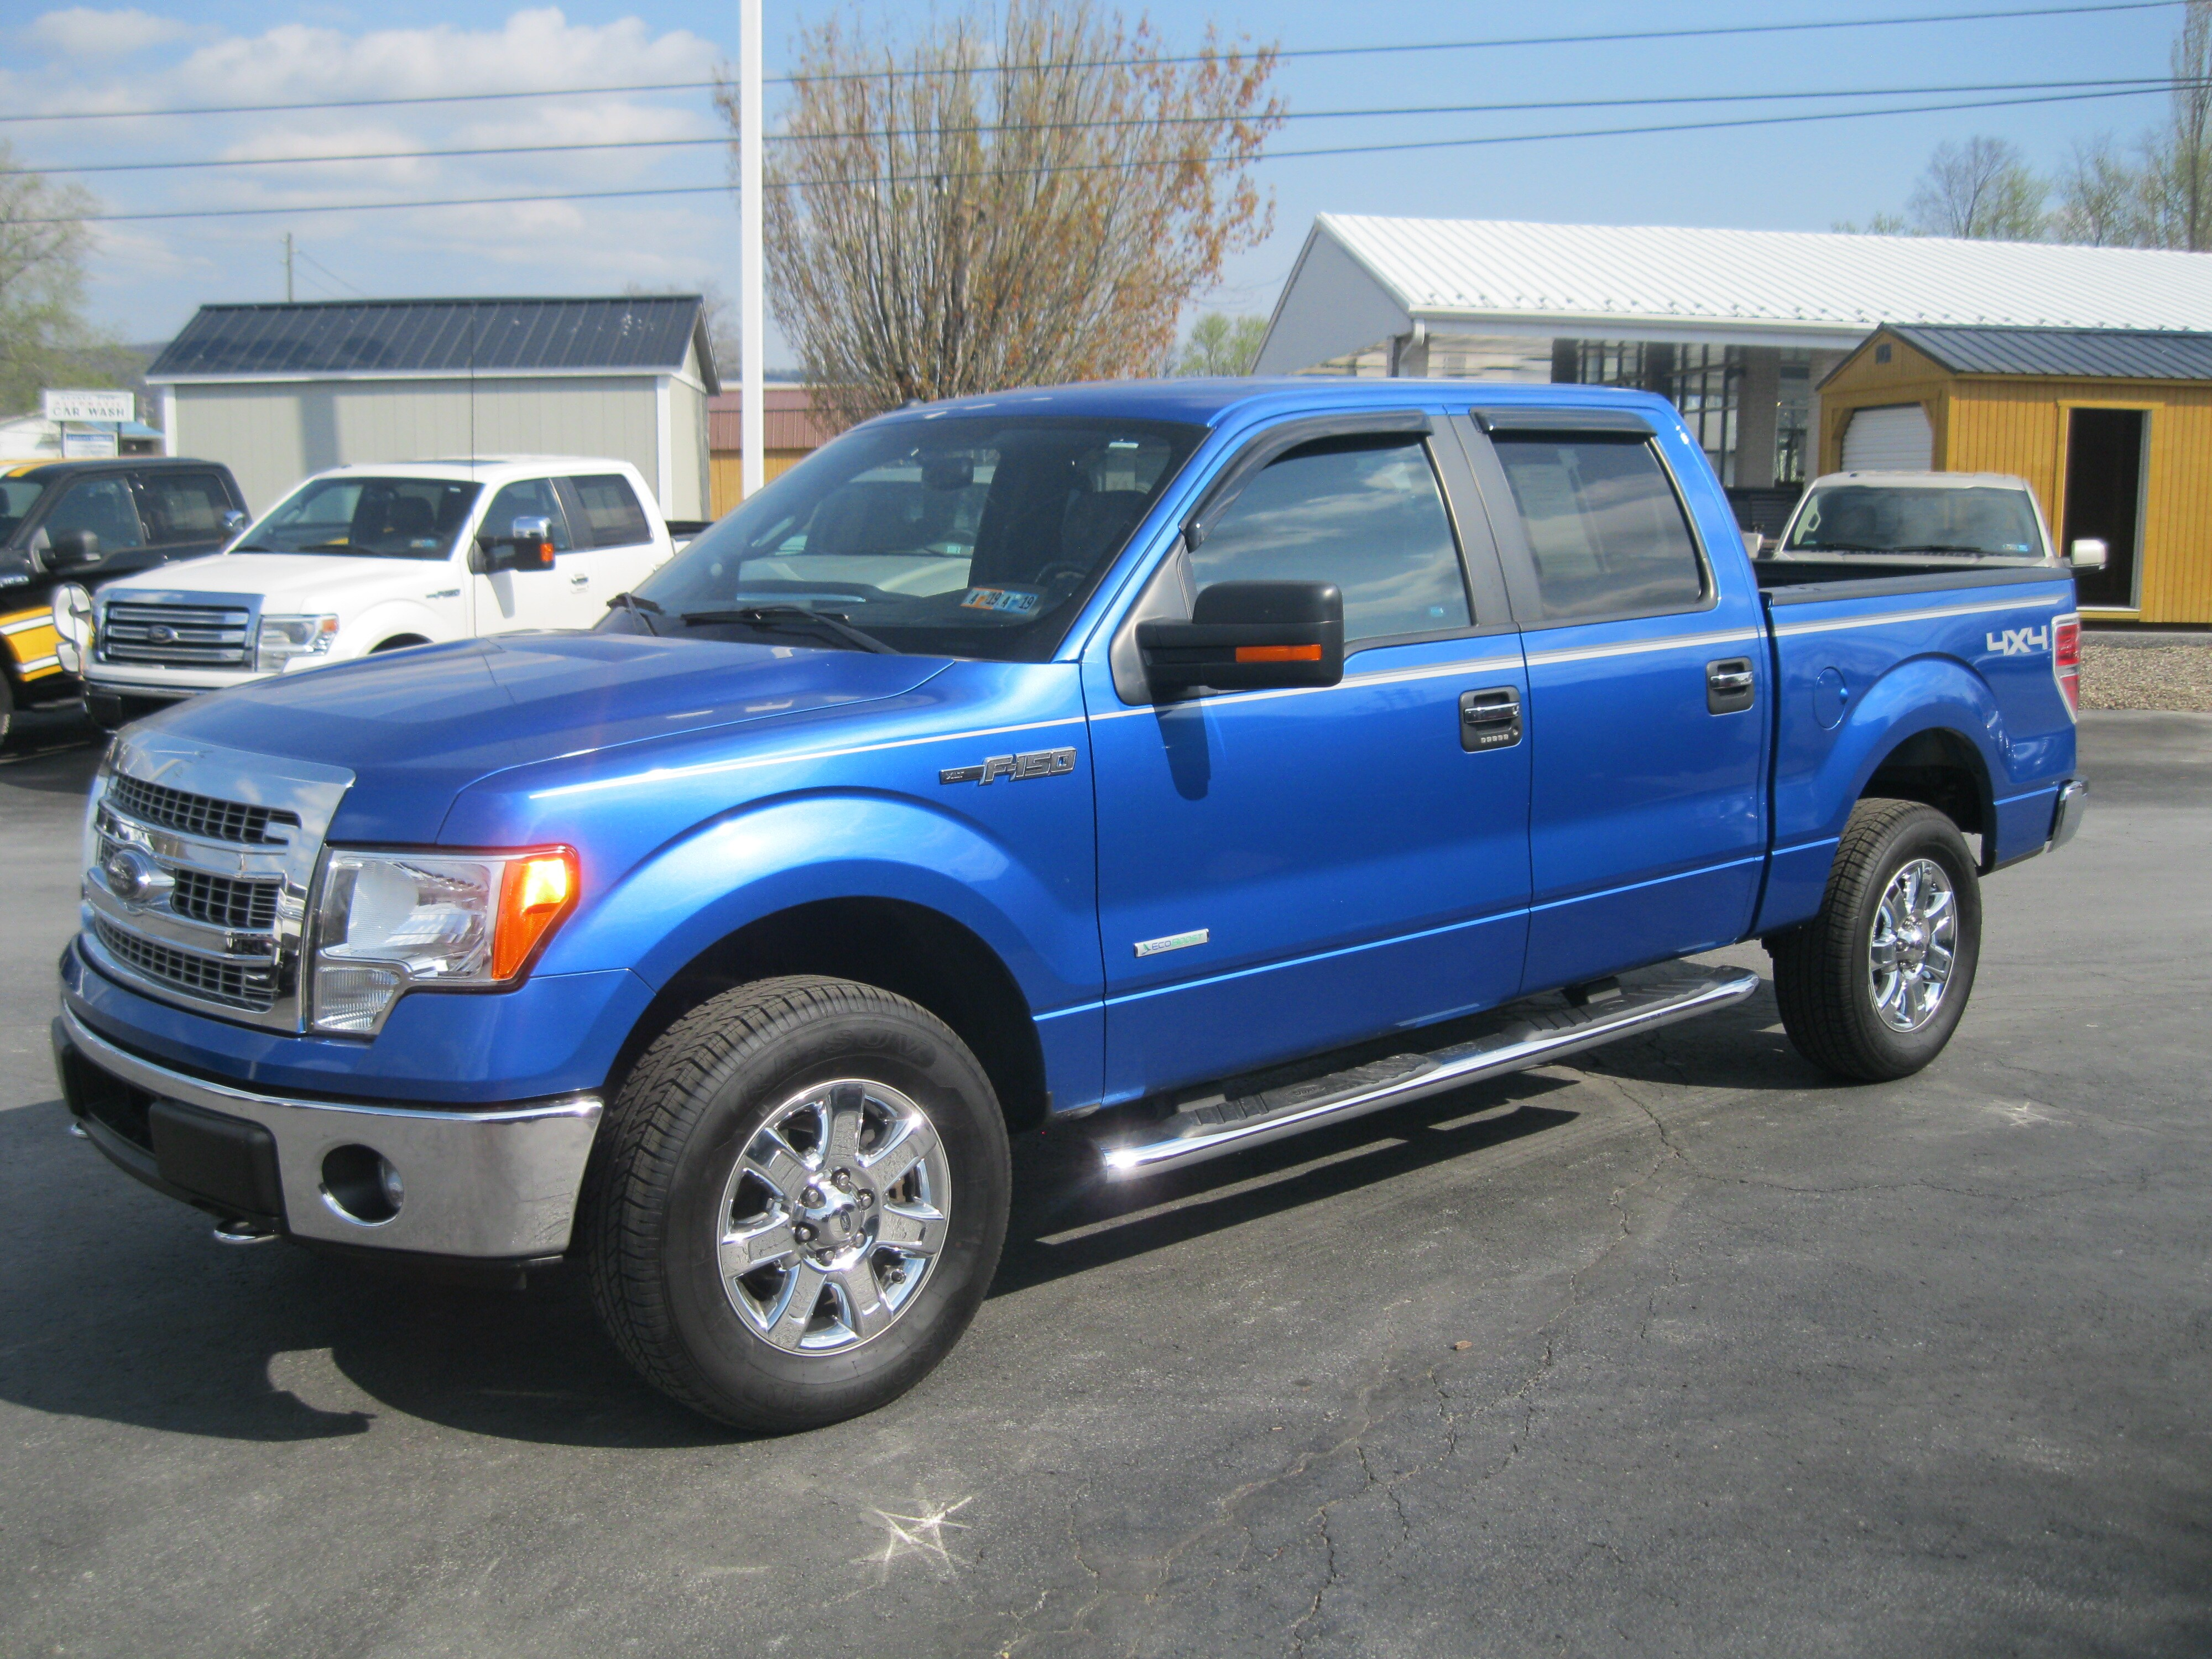 2014 Ford F150 CC XLT 4X4 6 Speed Automatic Truck